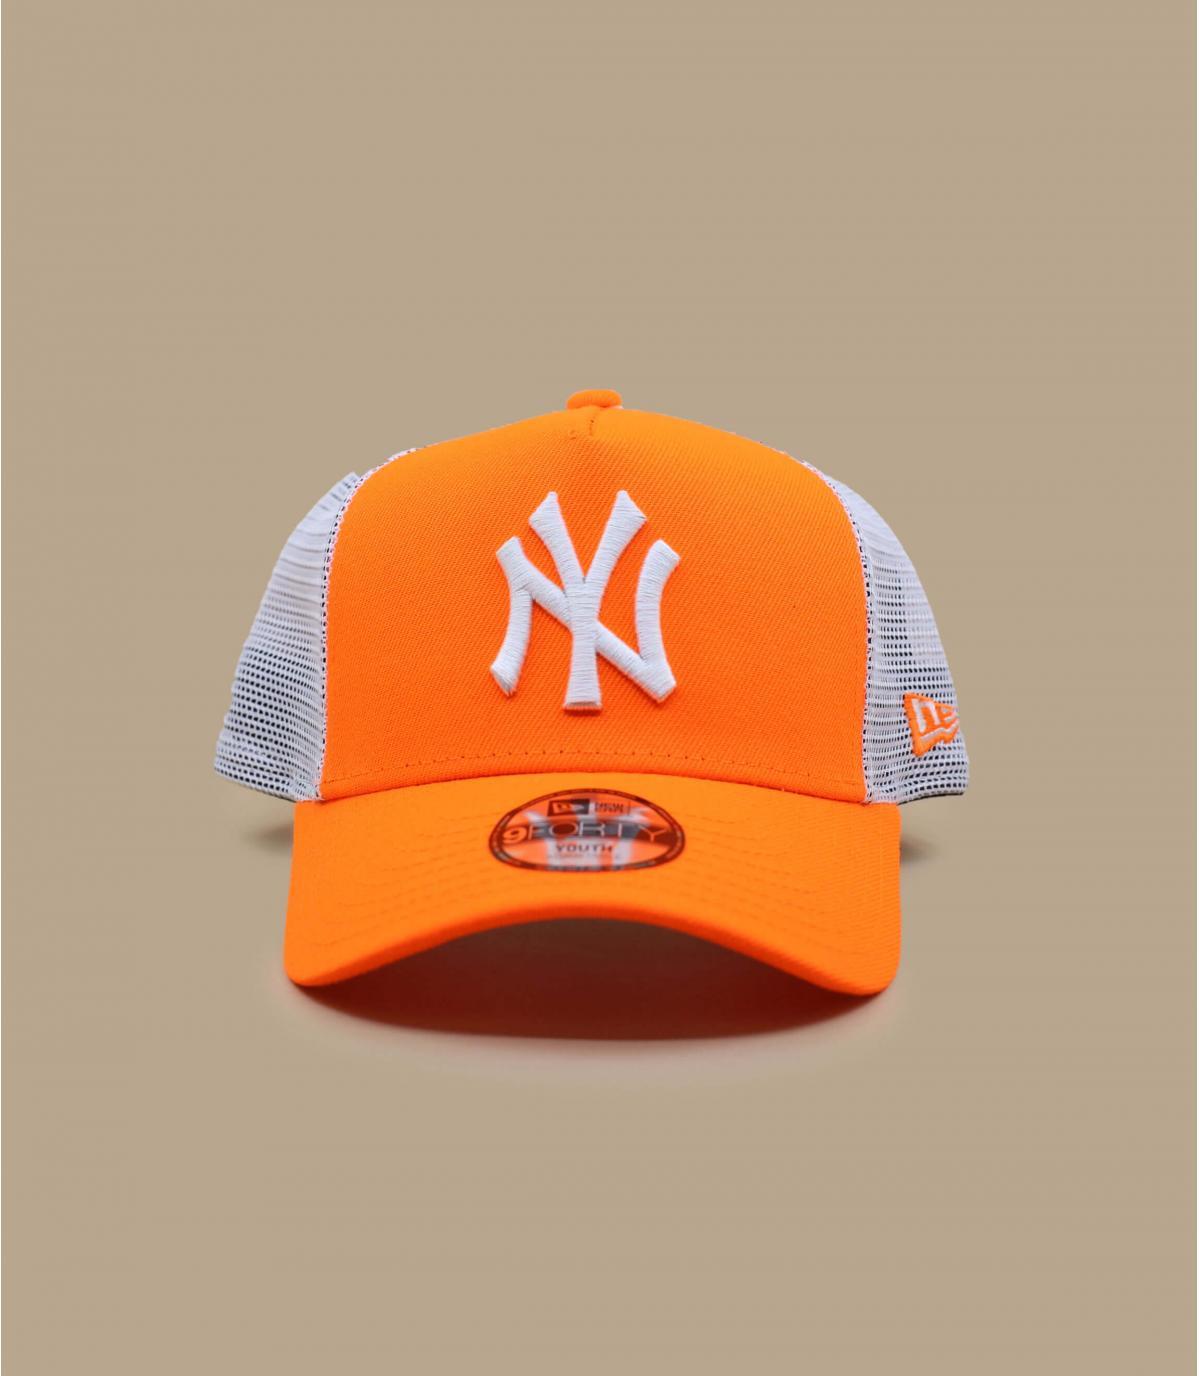 Orange NY trucker children